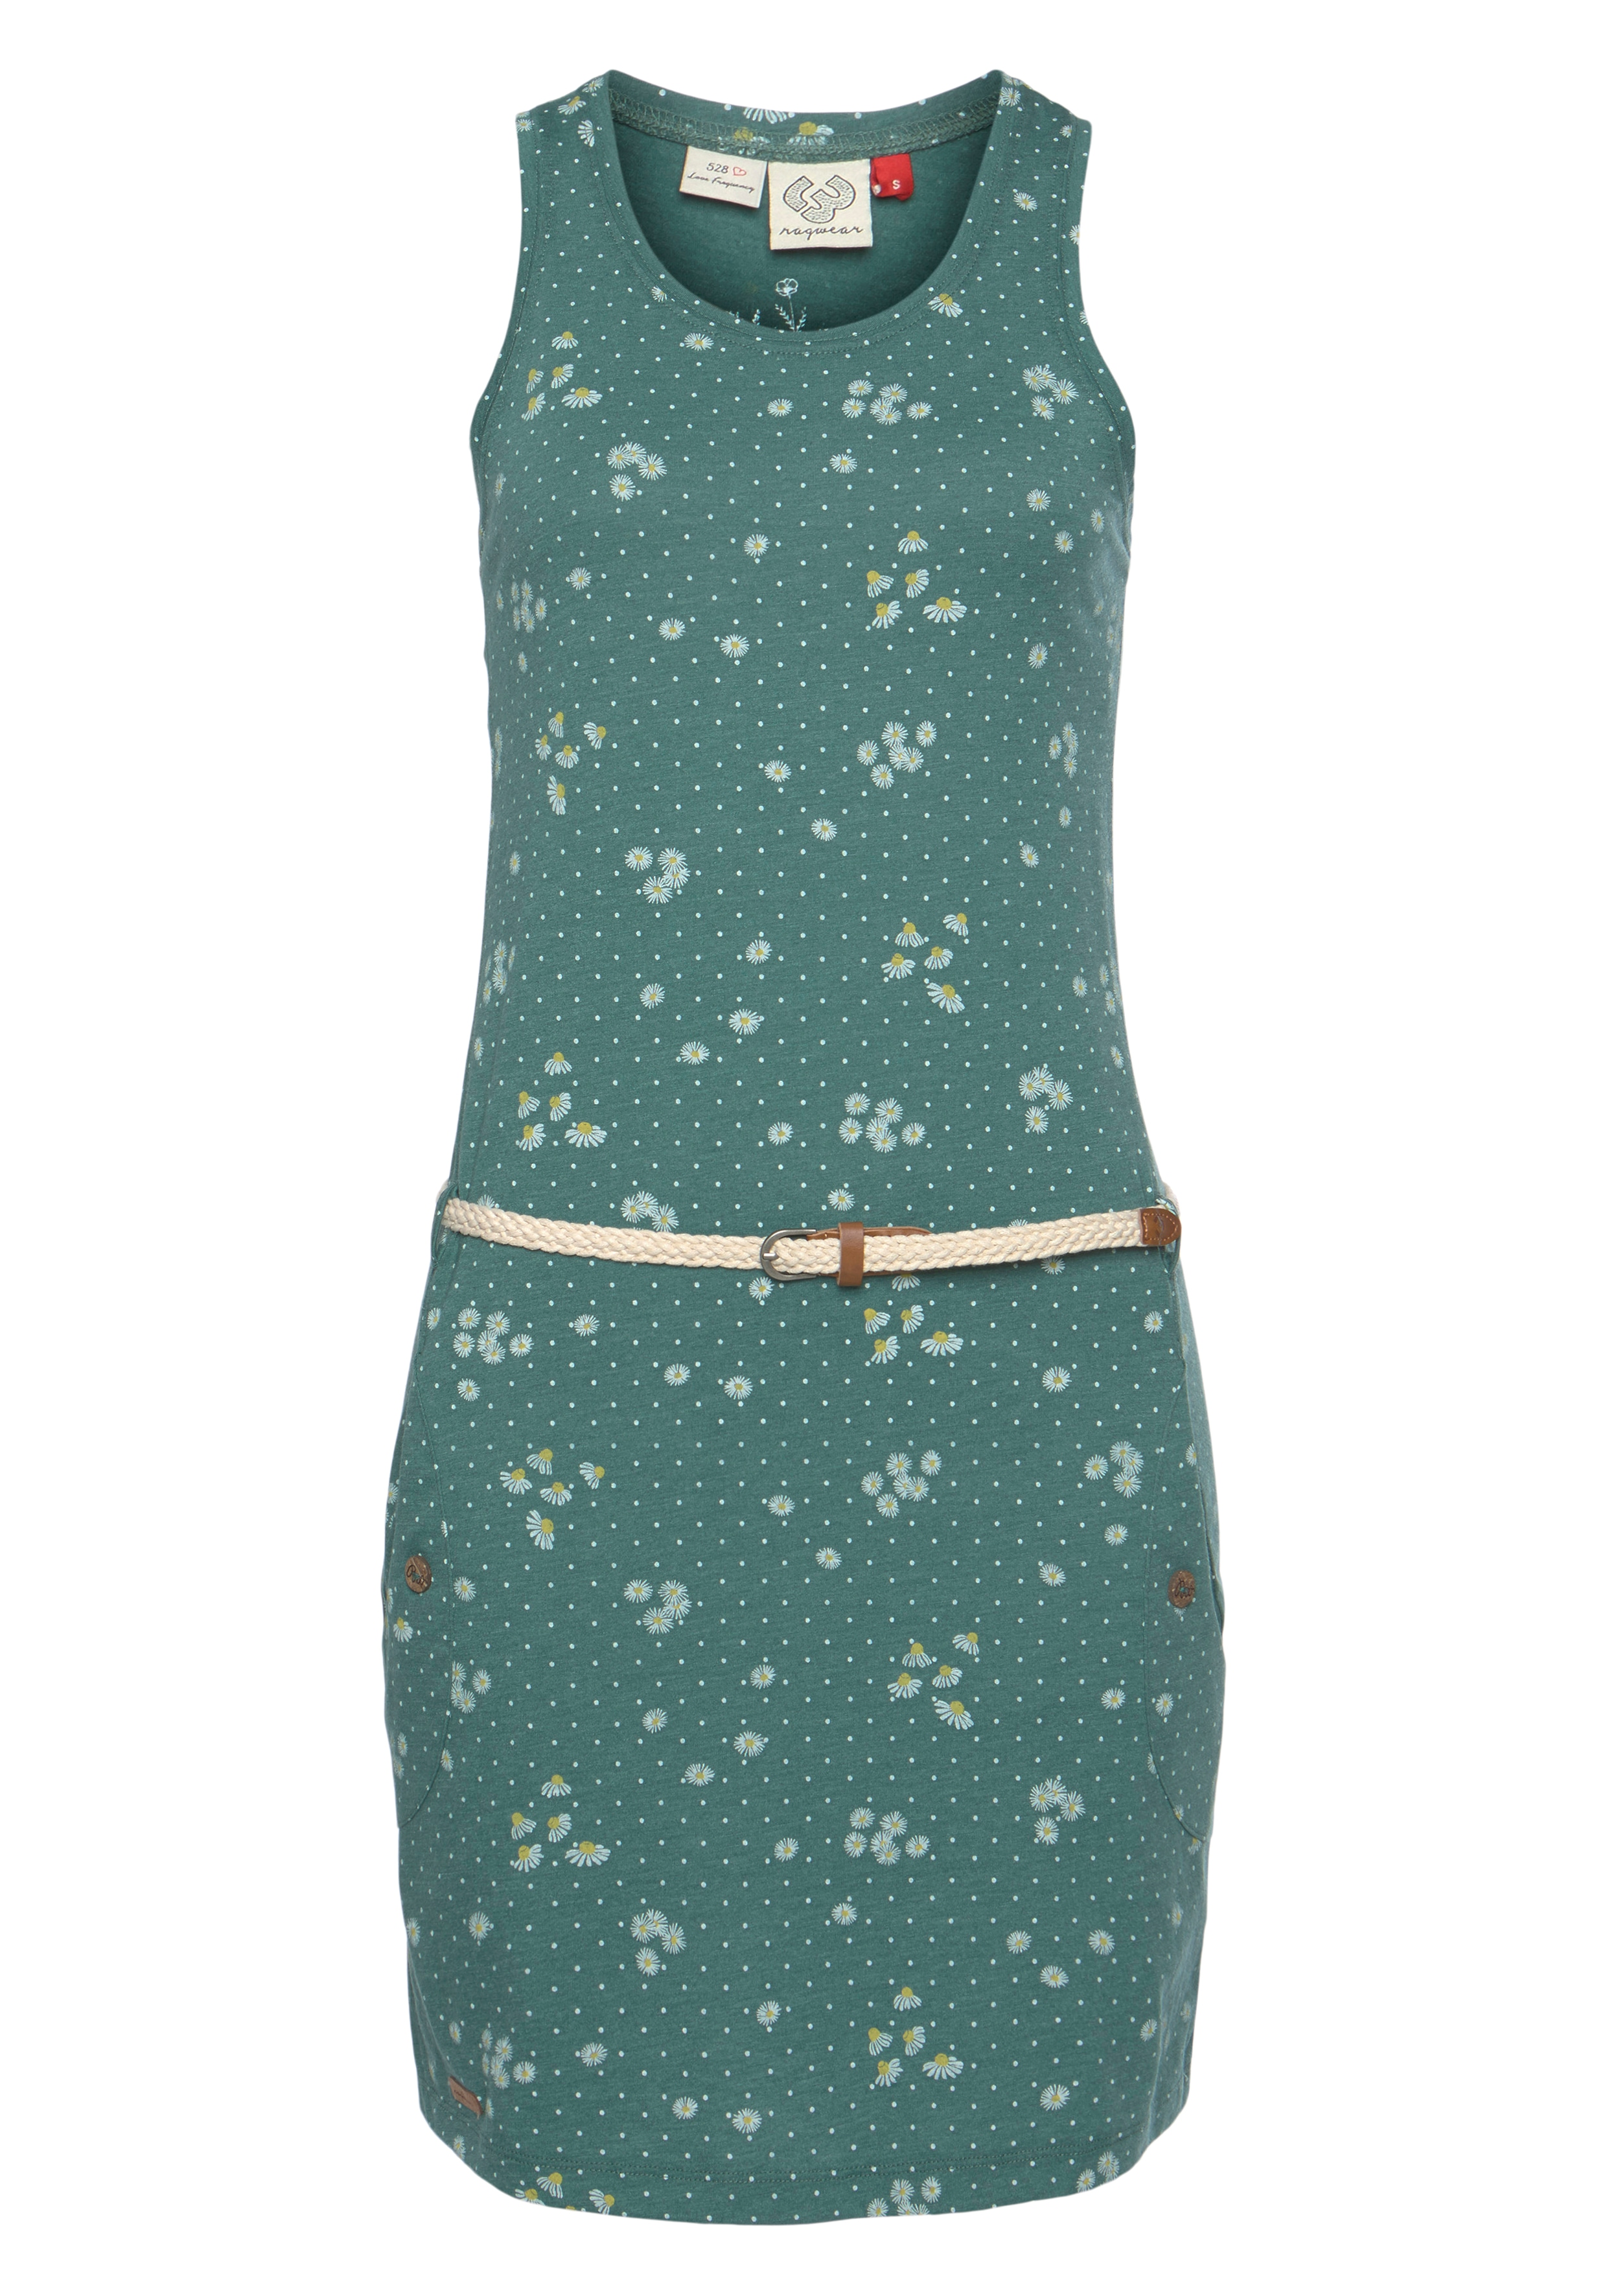 ragwear -  Shirtkleid KESY, (2 tlg., mit abnehmbarem Gürtel), Allover-Trend Druck: Kamille